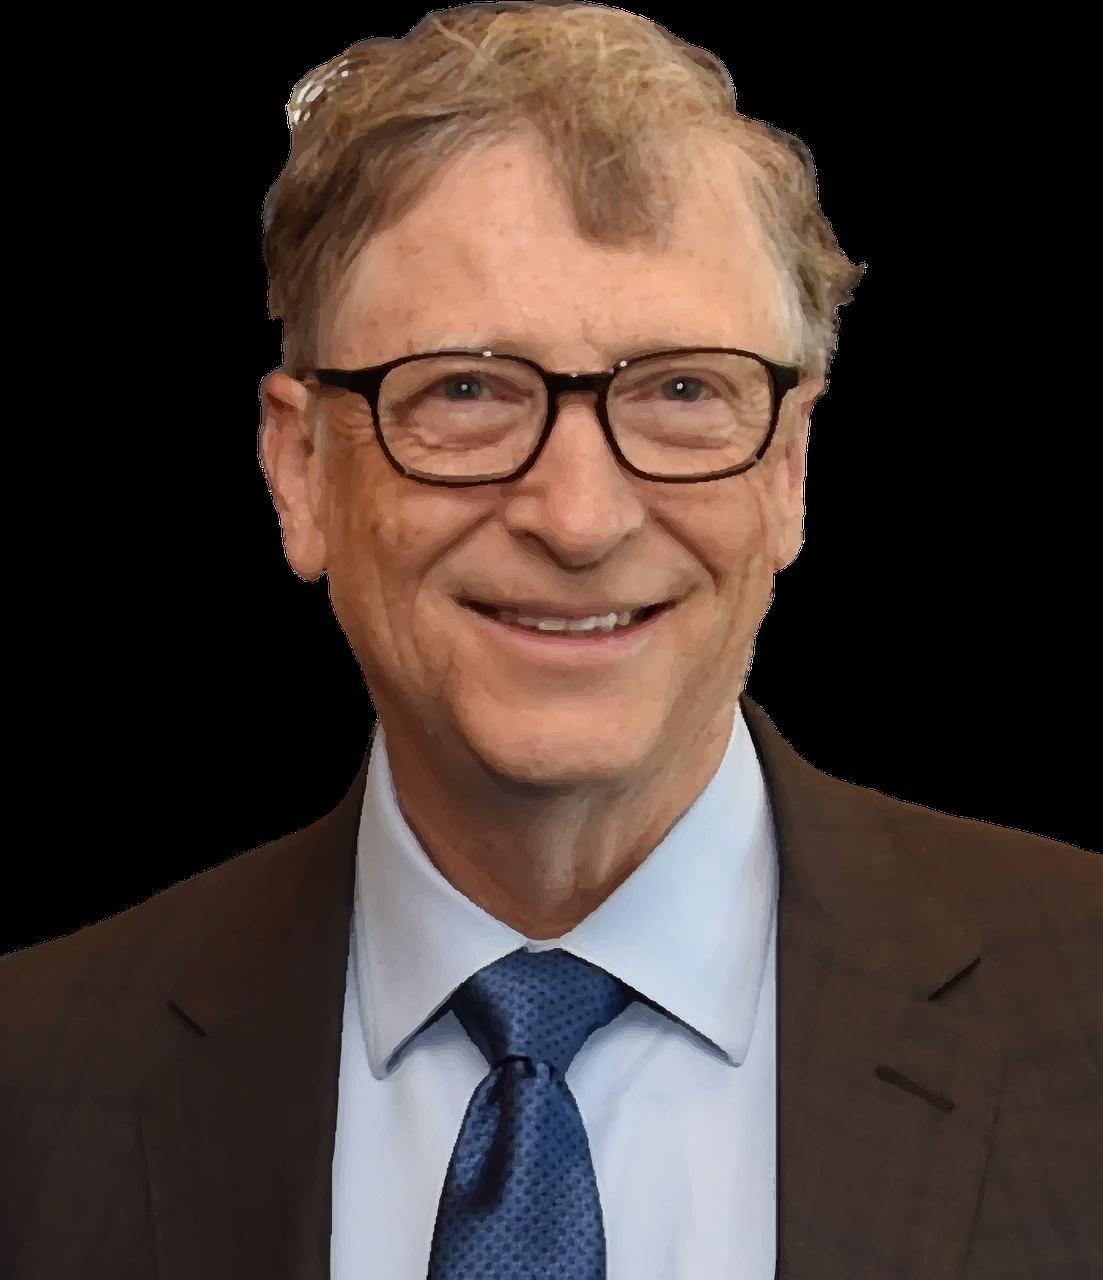 Bill Gates PNG Download Image